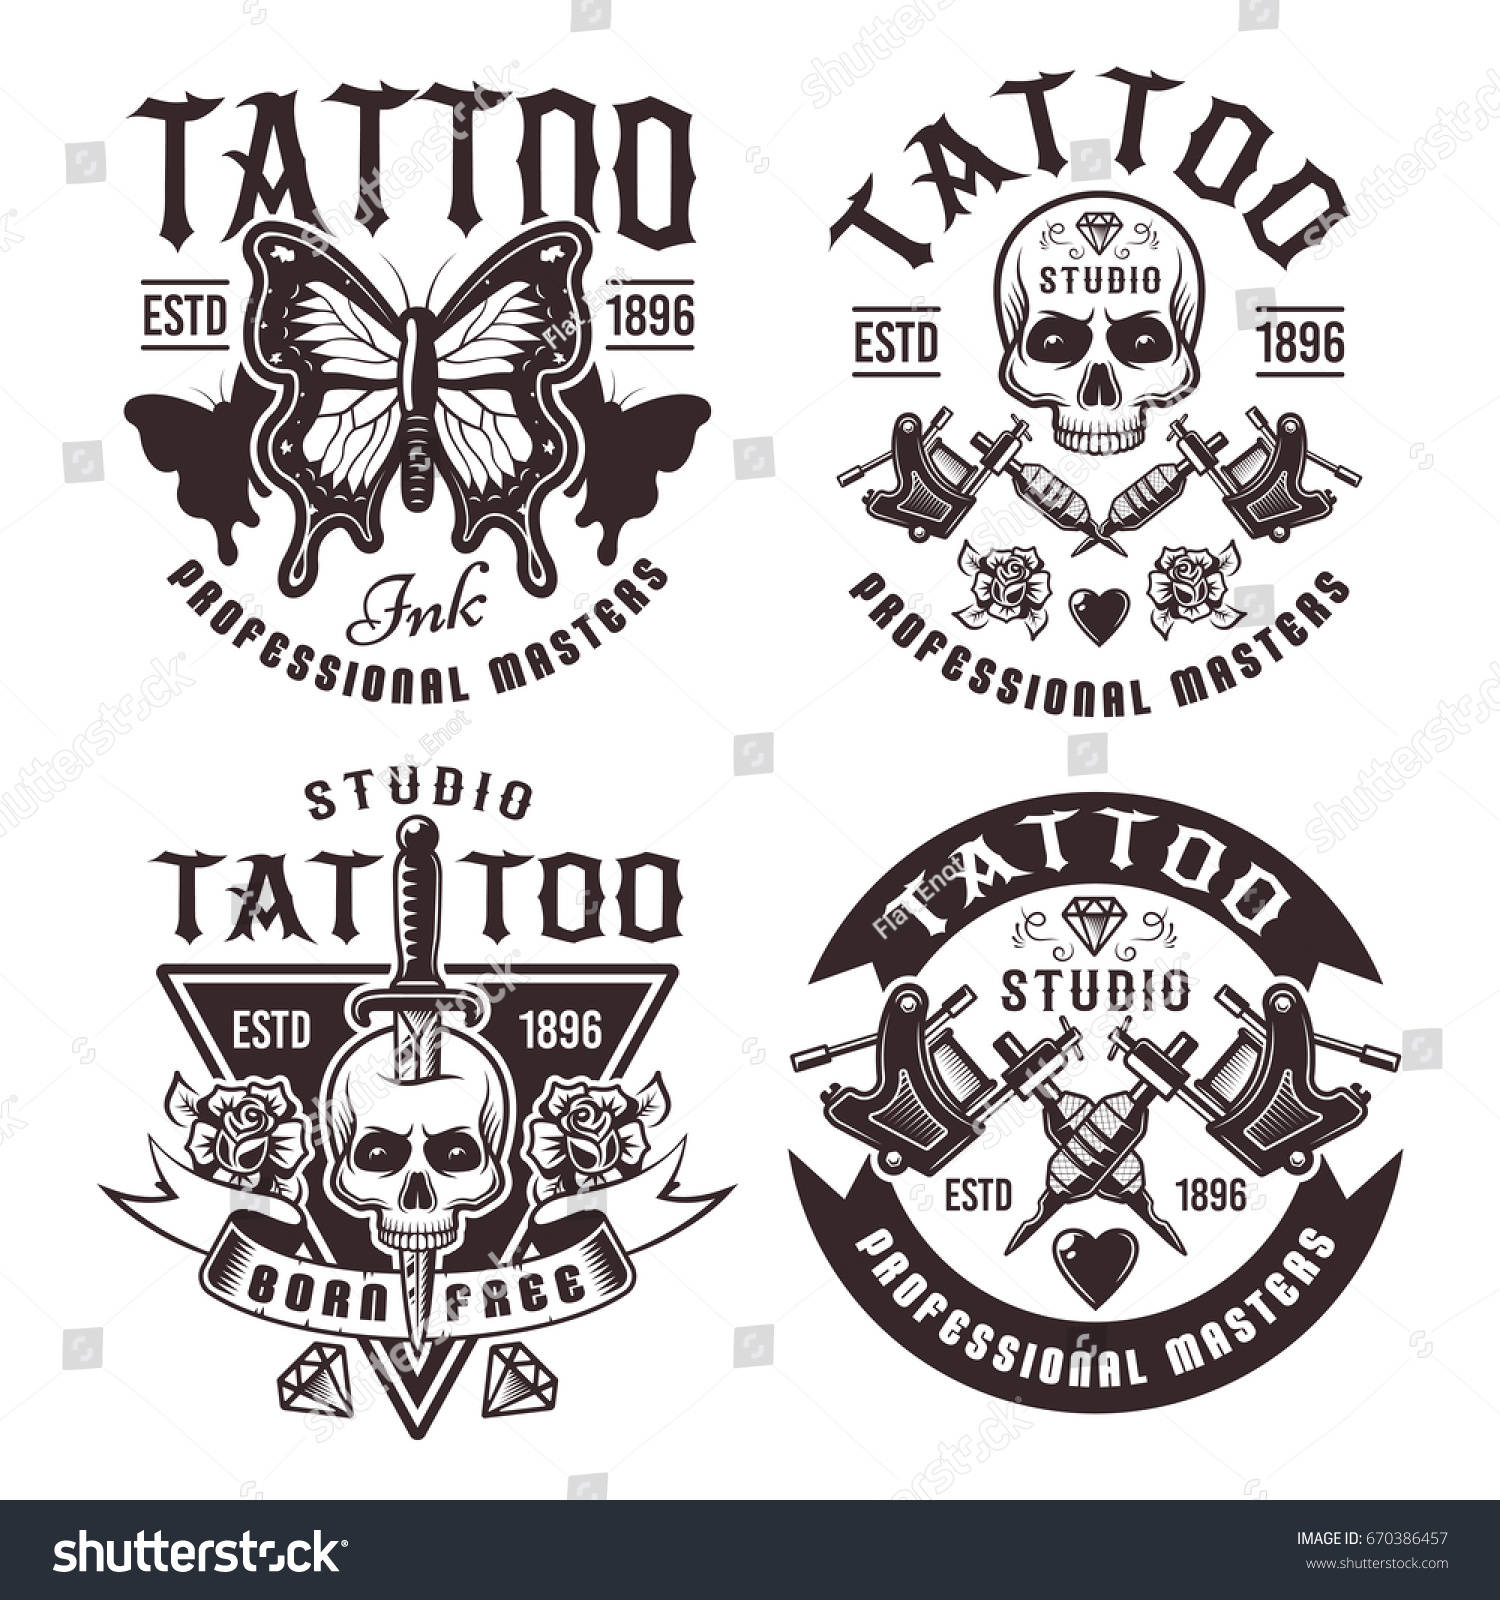 tattoo studio set four vector vintage stock vector ForTattoo Style Logo Design